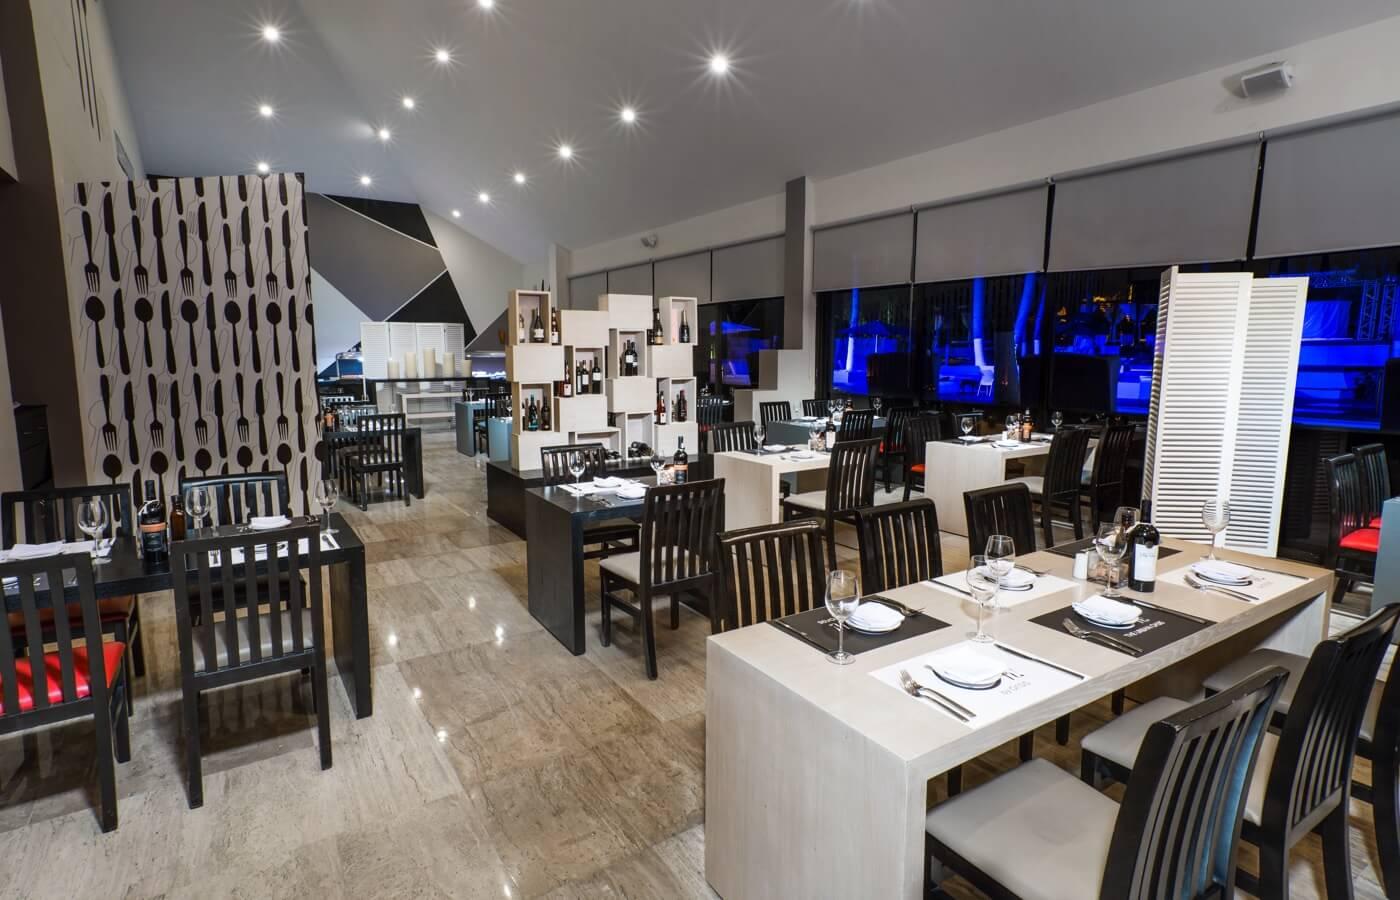 Vista interior de Restaurante Mega Bites en Hotel Oh! Cancun The Urban Oasis